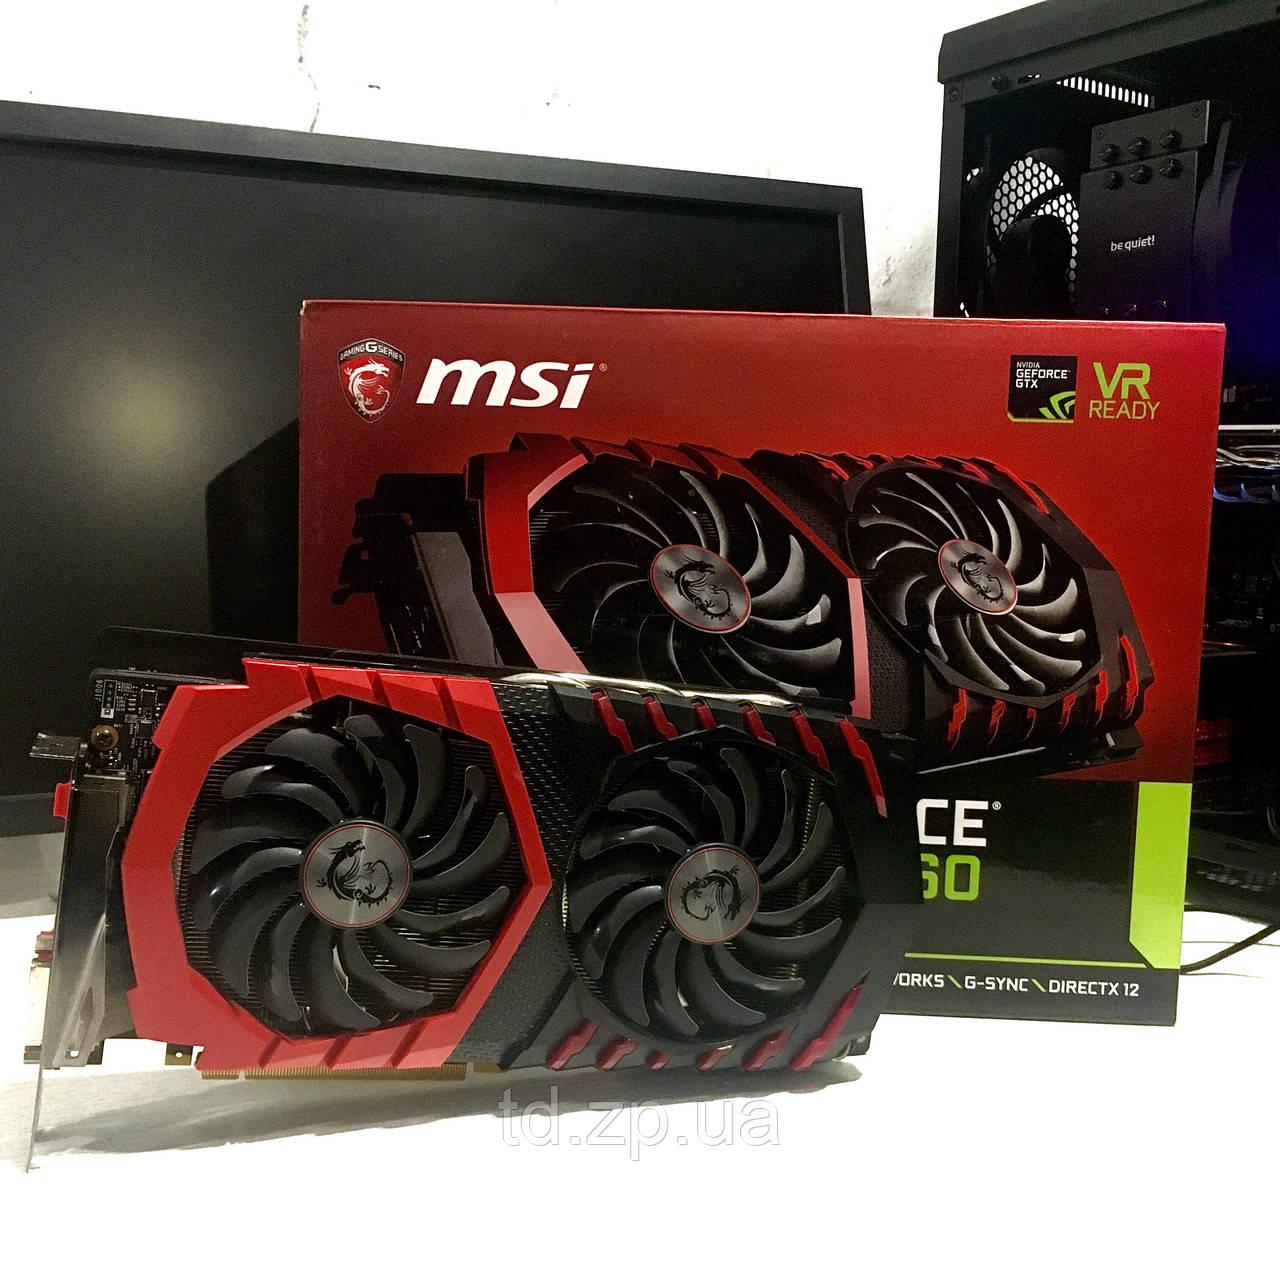 Видеокарта MSI GTX 1060 6Gb GAMING X